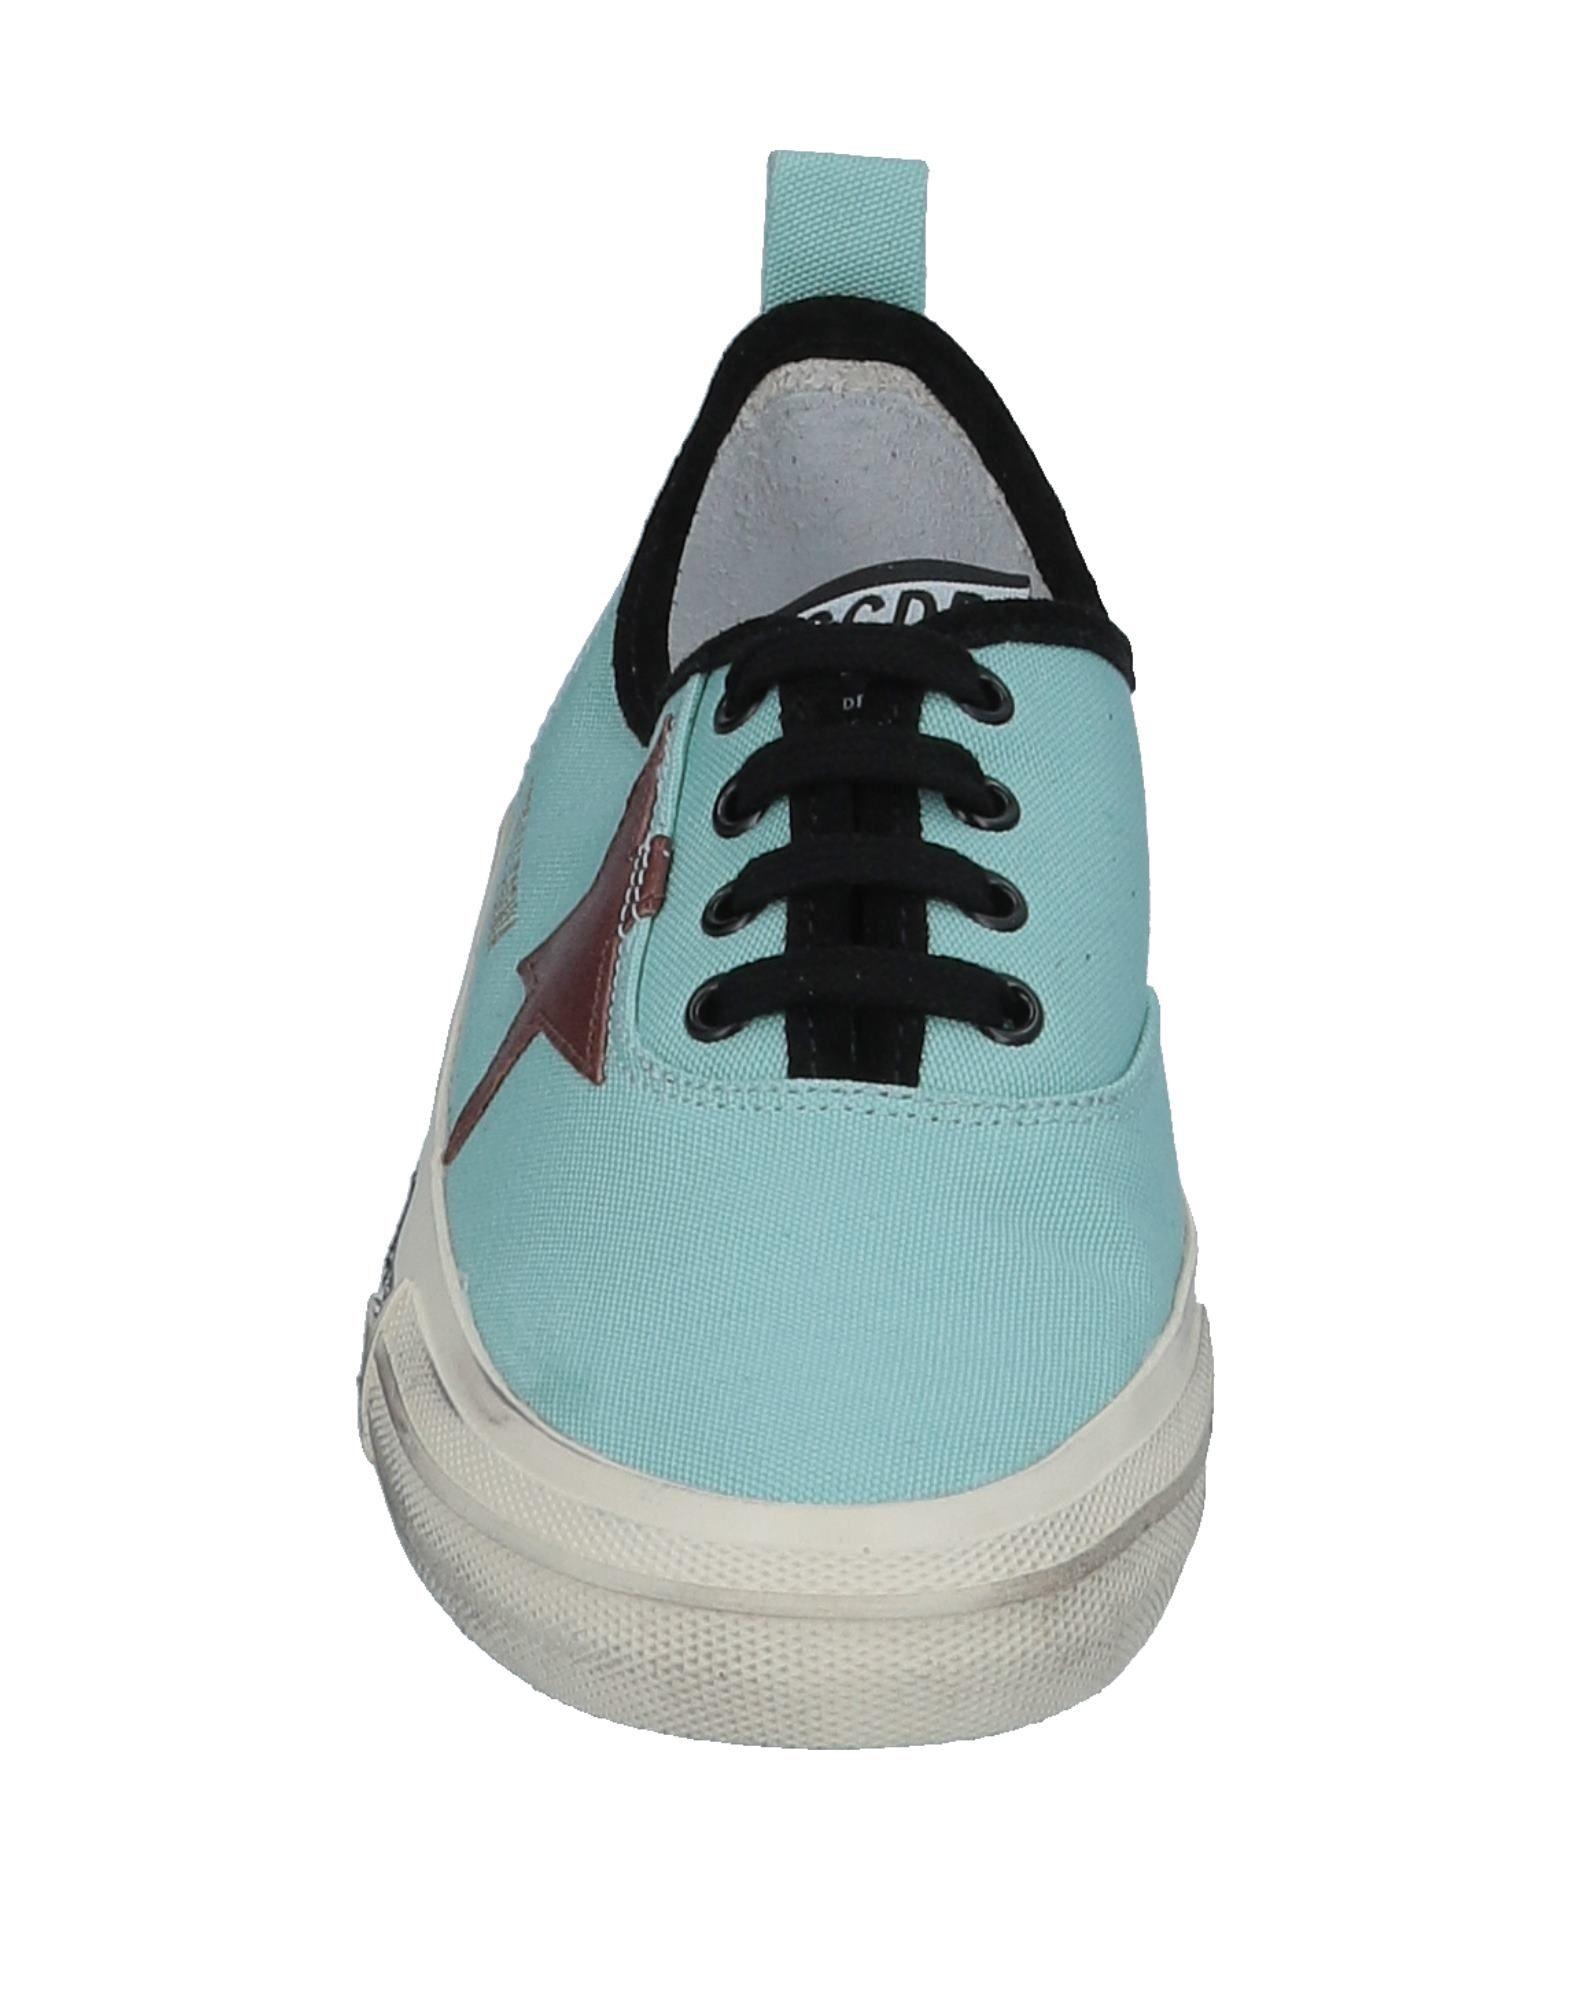 Golden Goose Deluxe Brand Sneakers Damen Schuhe  11507048WGGut aussehende strapazierfähige Schuhe Damen 814a95